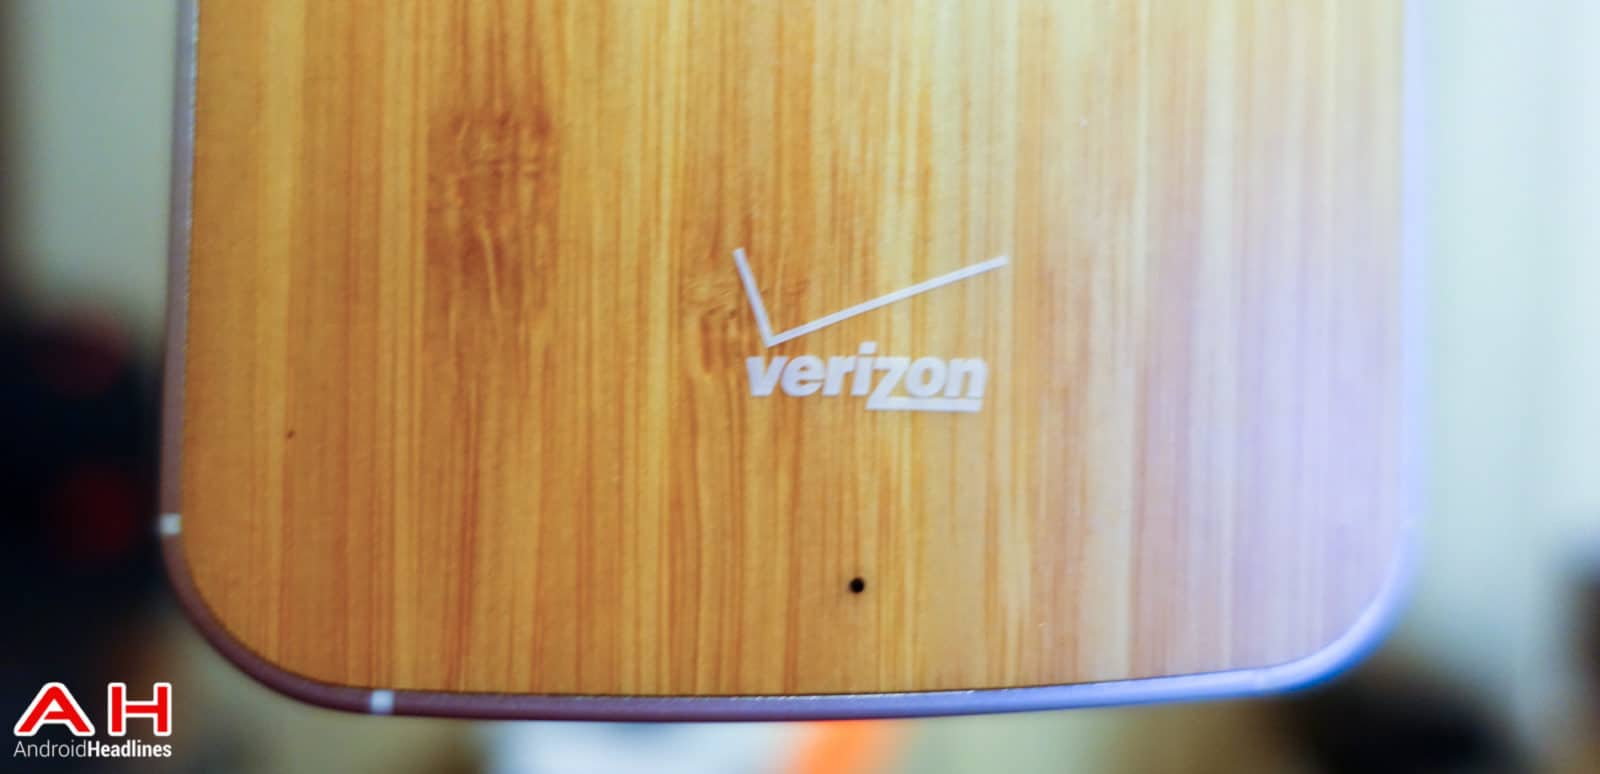 Verizon-Logo-AH-112014-2